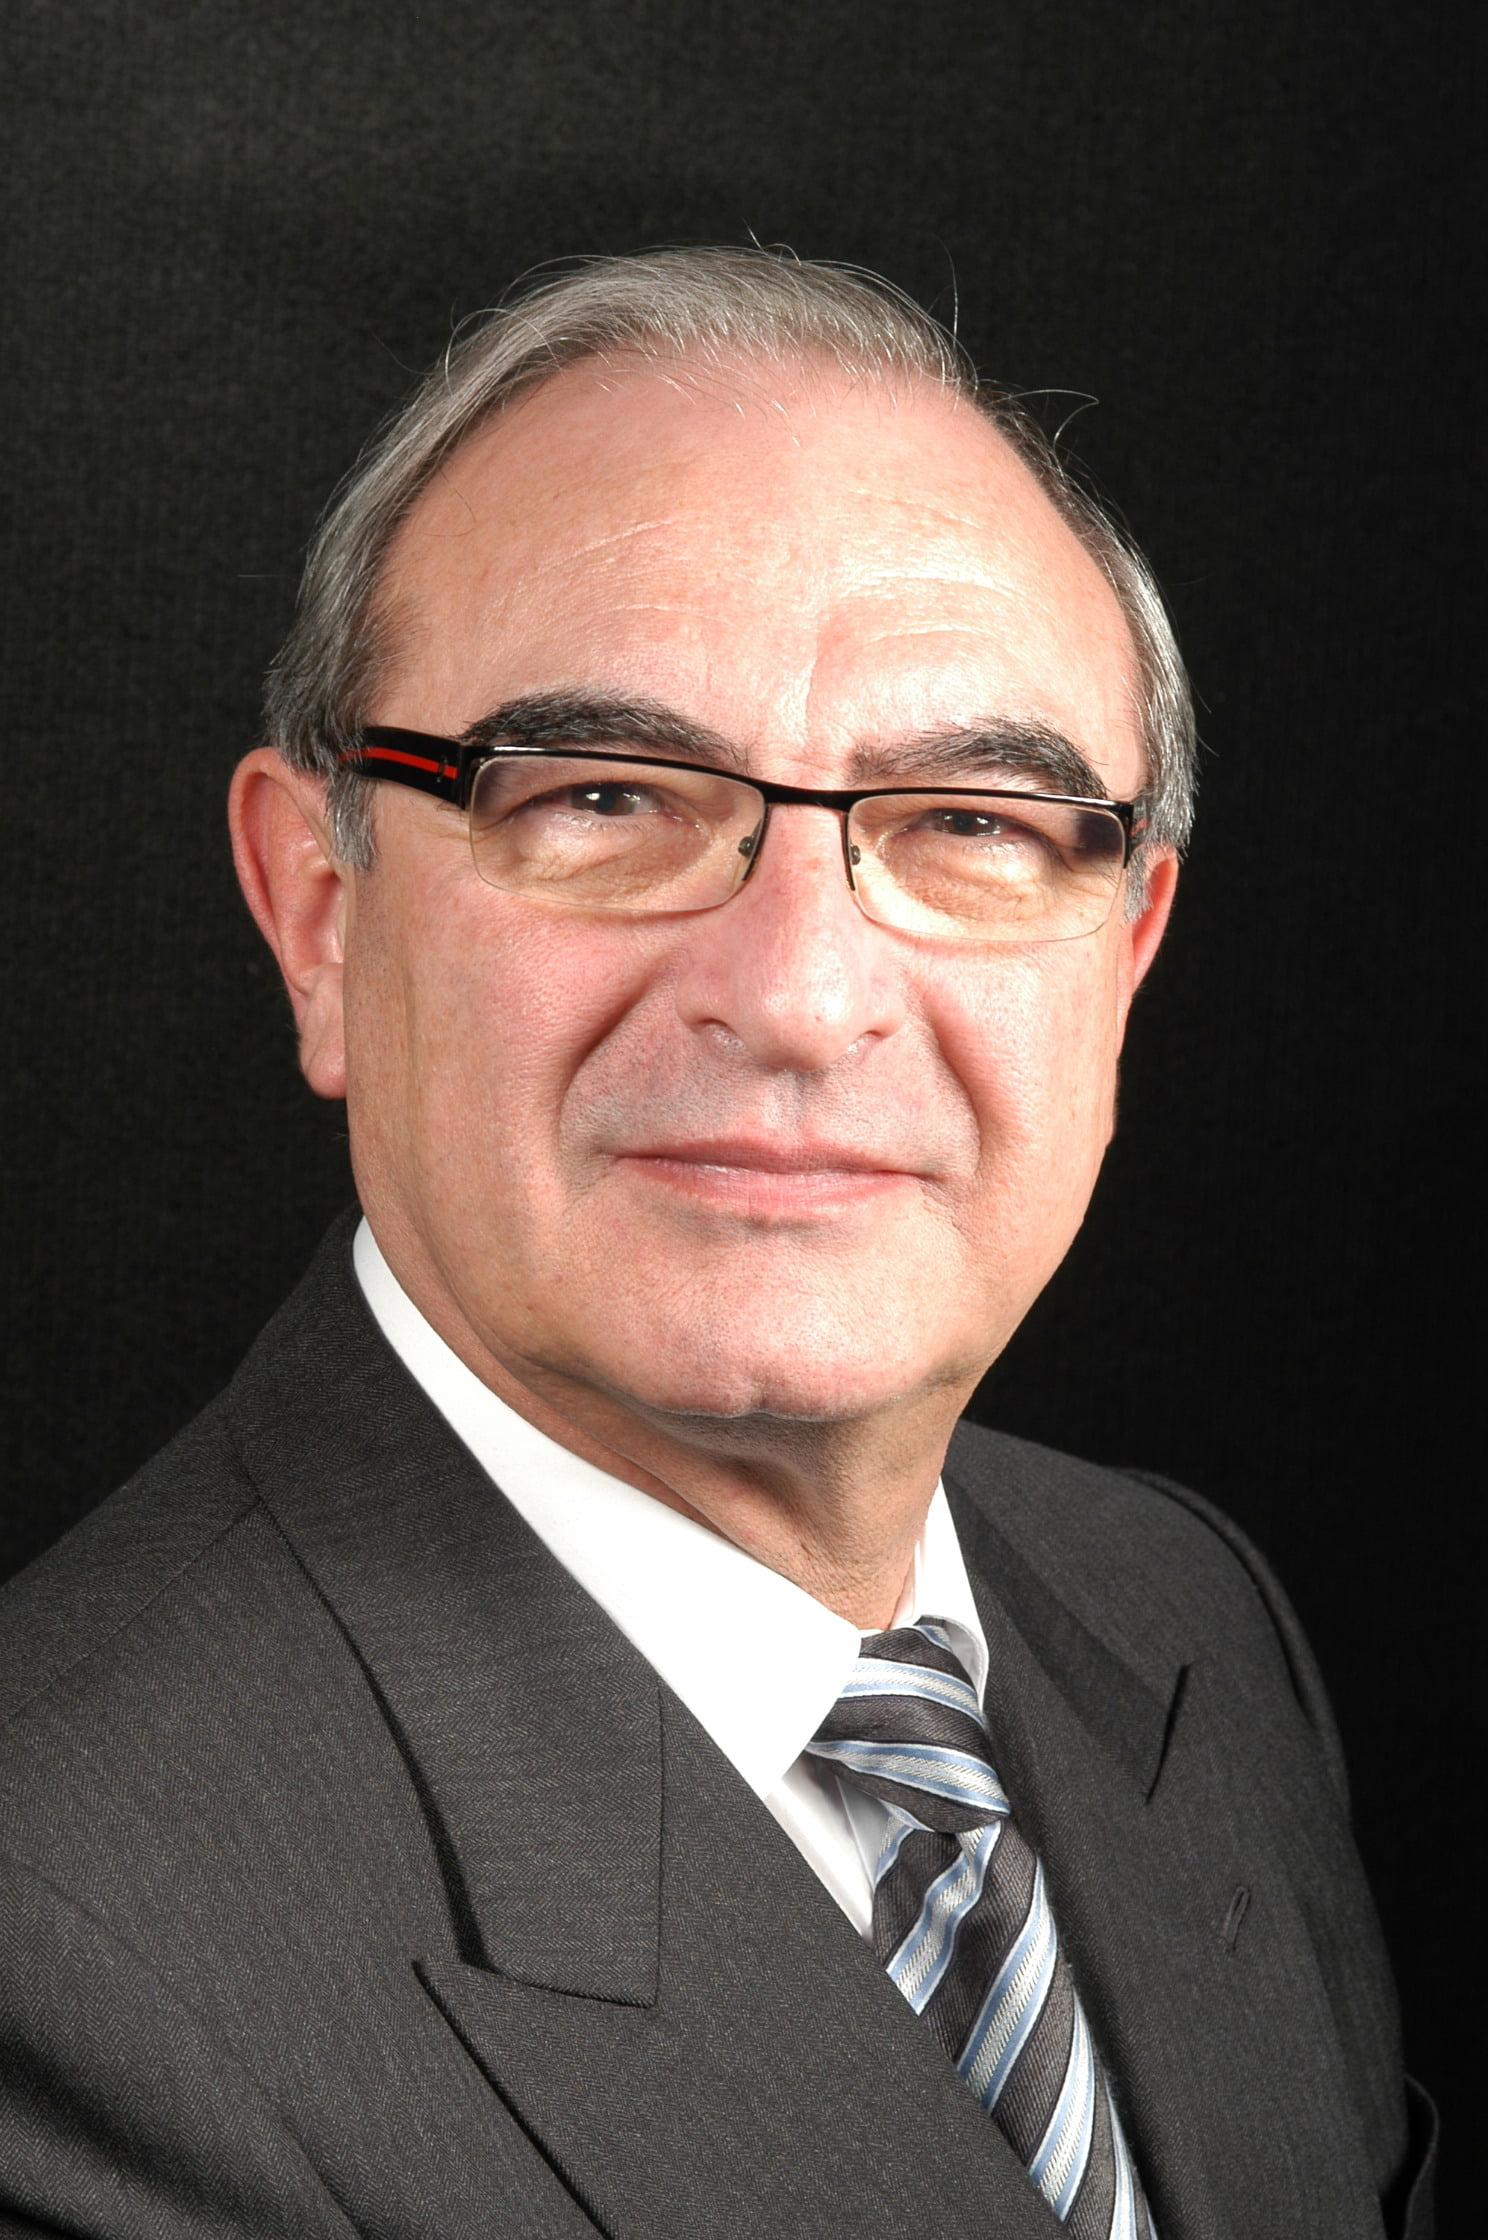 Sr. Jaime Pujol Palés